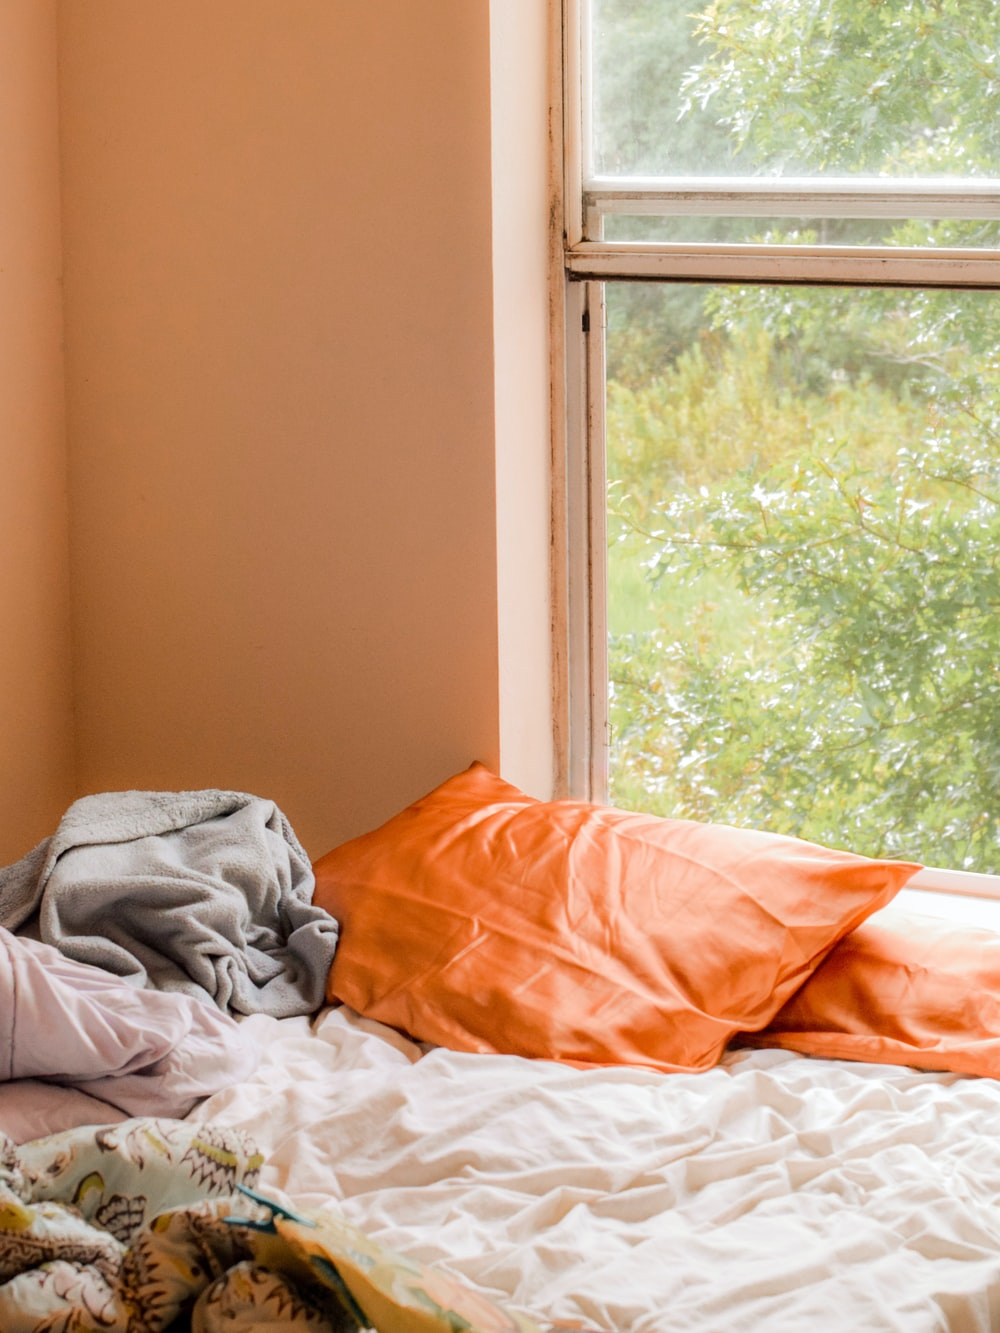 orange pillowcases